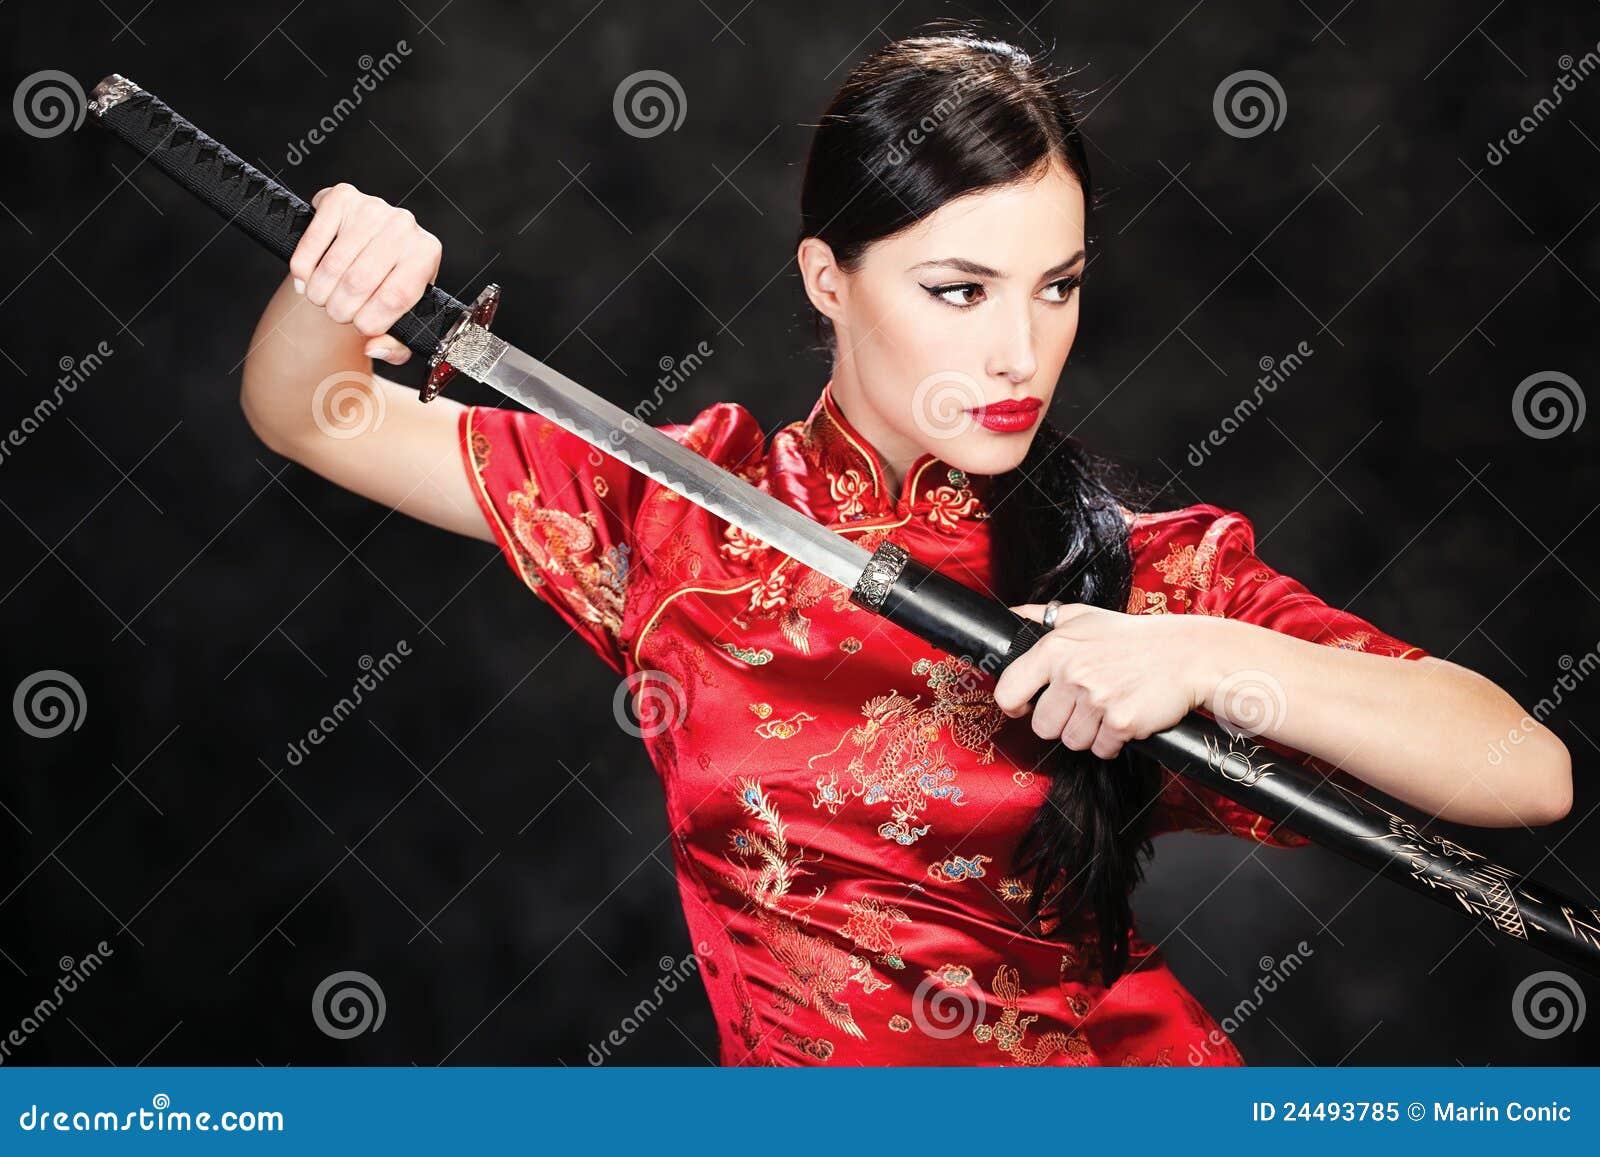 Девушка с самурайским мечом фото